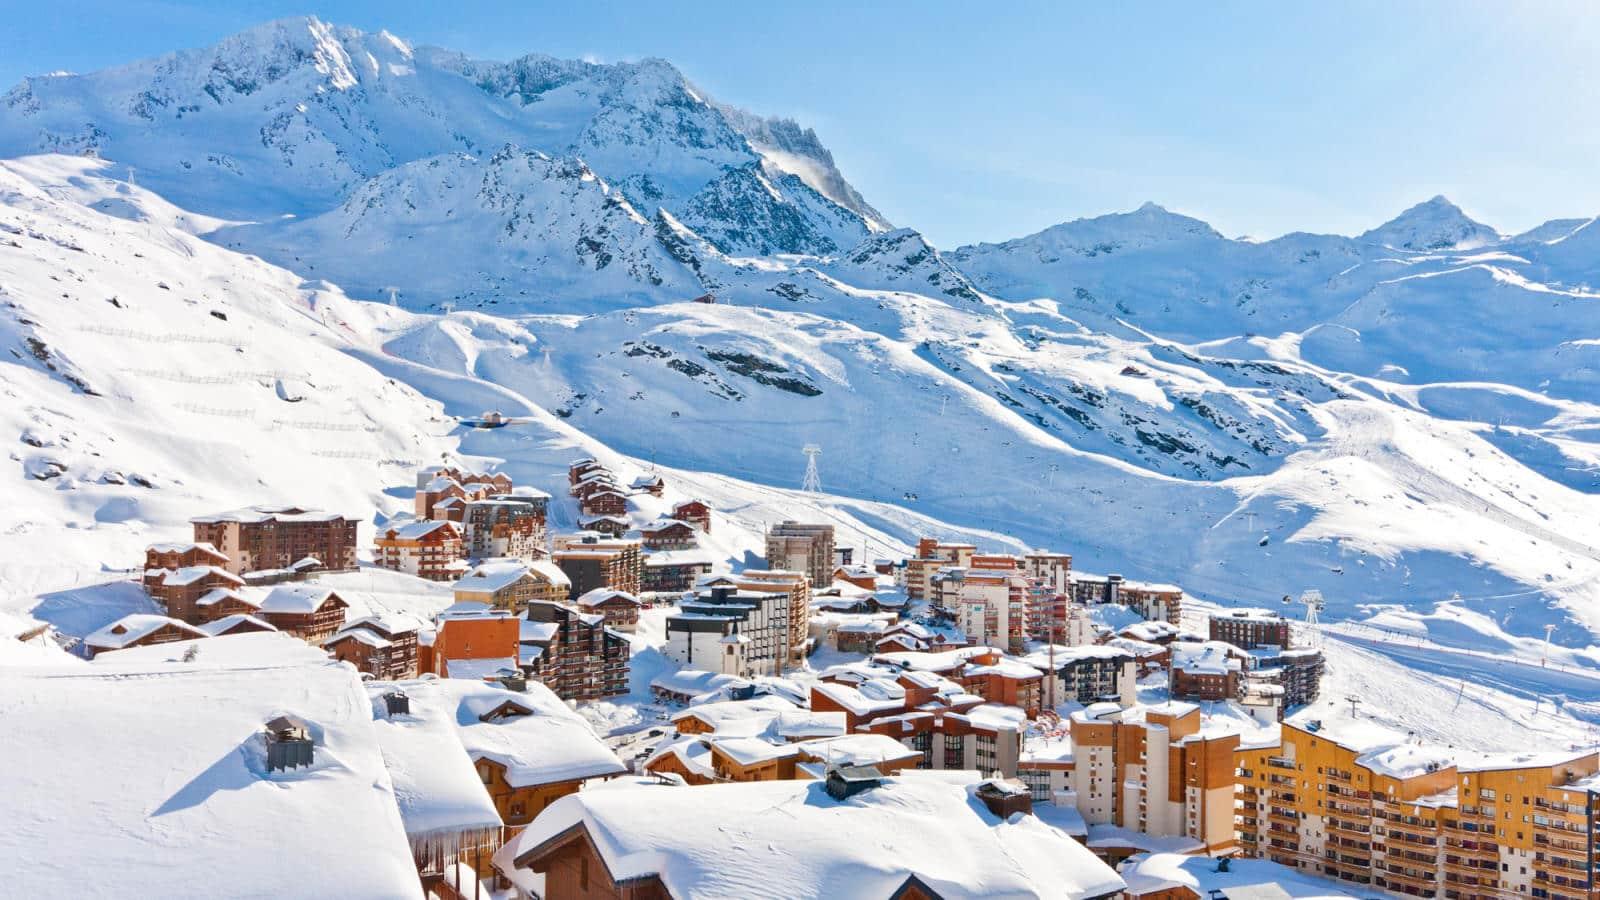 La station de ski Val Thorens